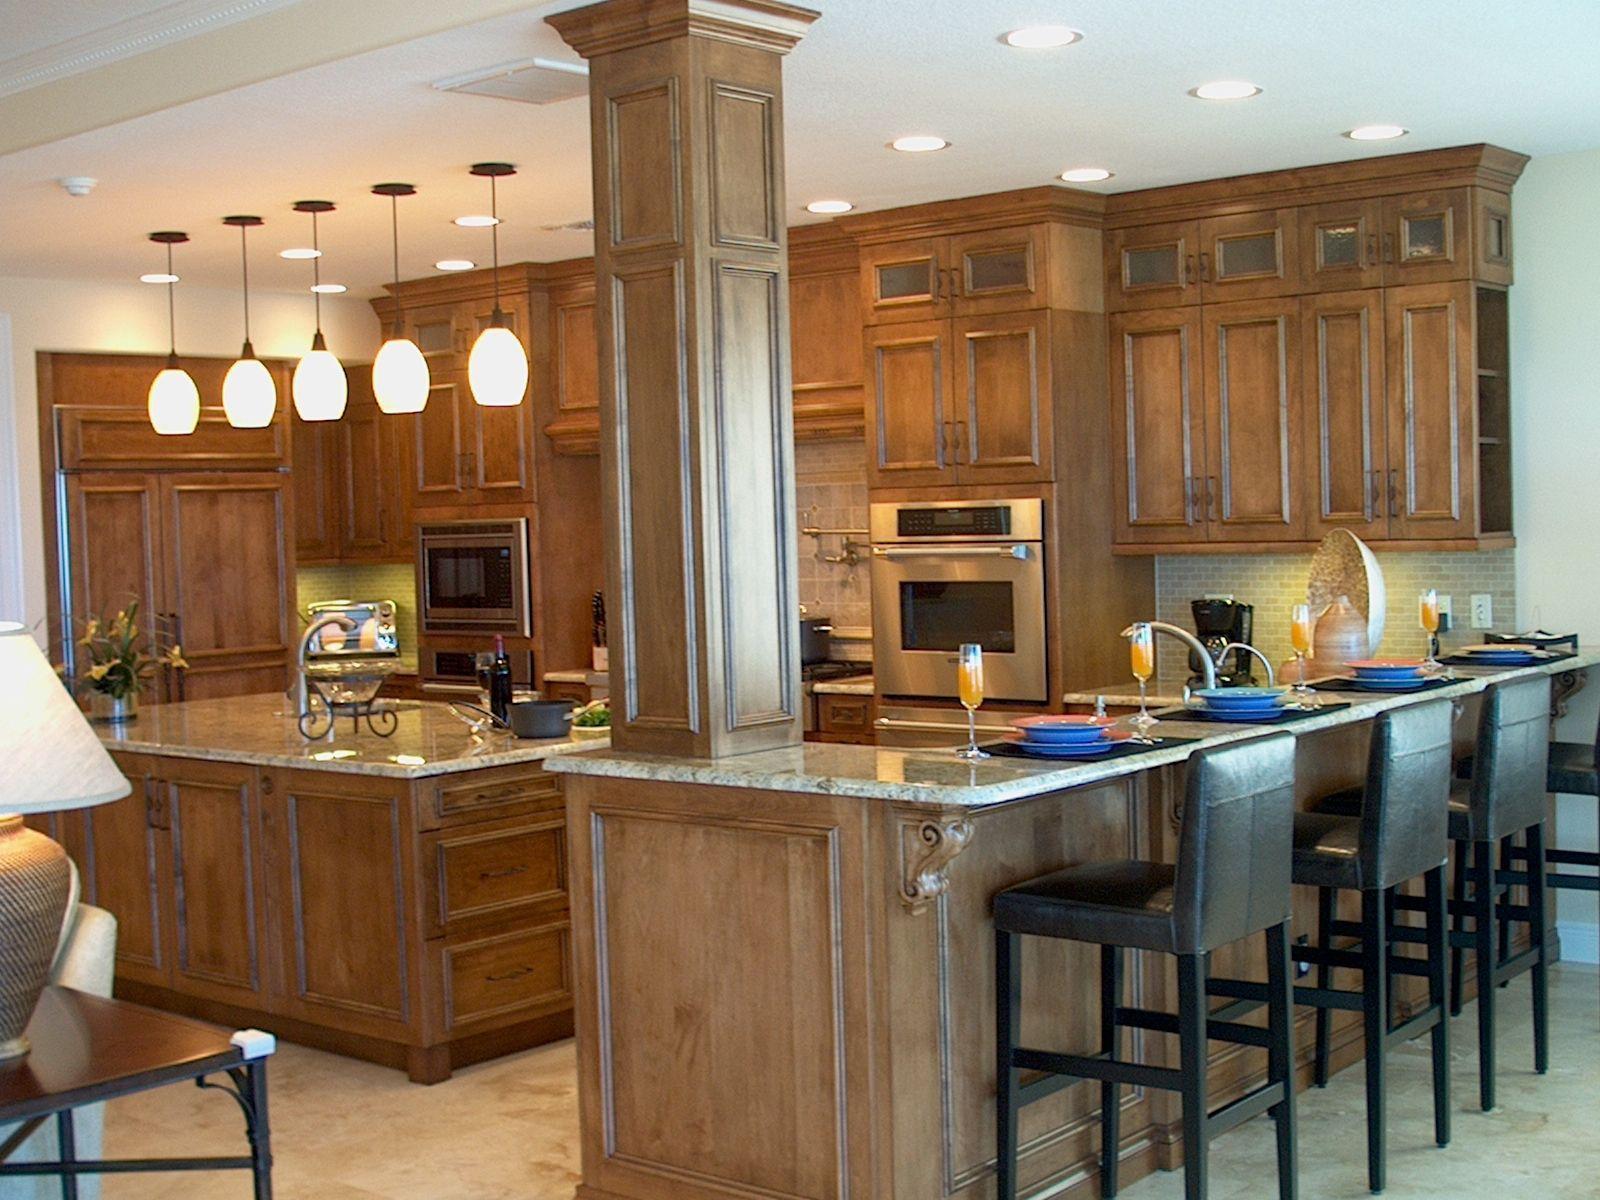 51 Reference Of Kitchen Cabinets Mediterranean Style In 2020 Home Decor Kitchen Kitchen Beautiful Kitchens